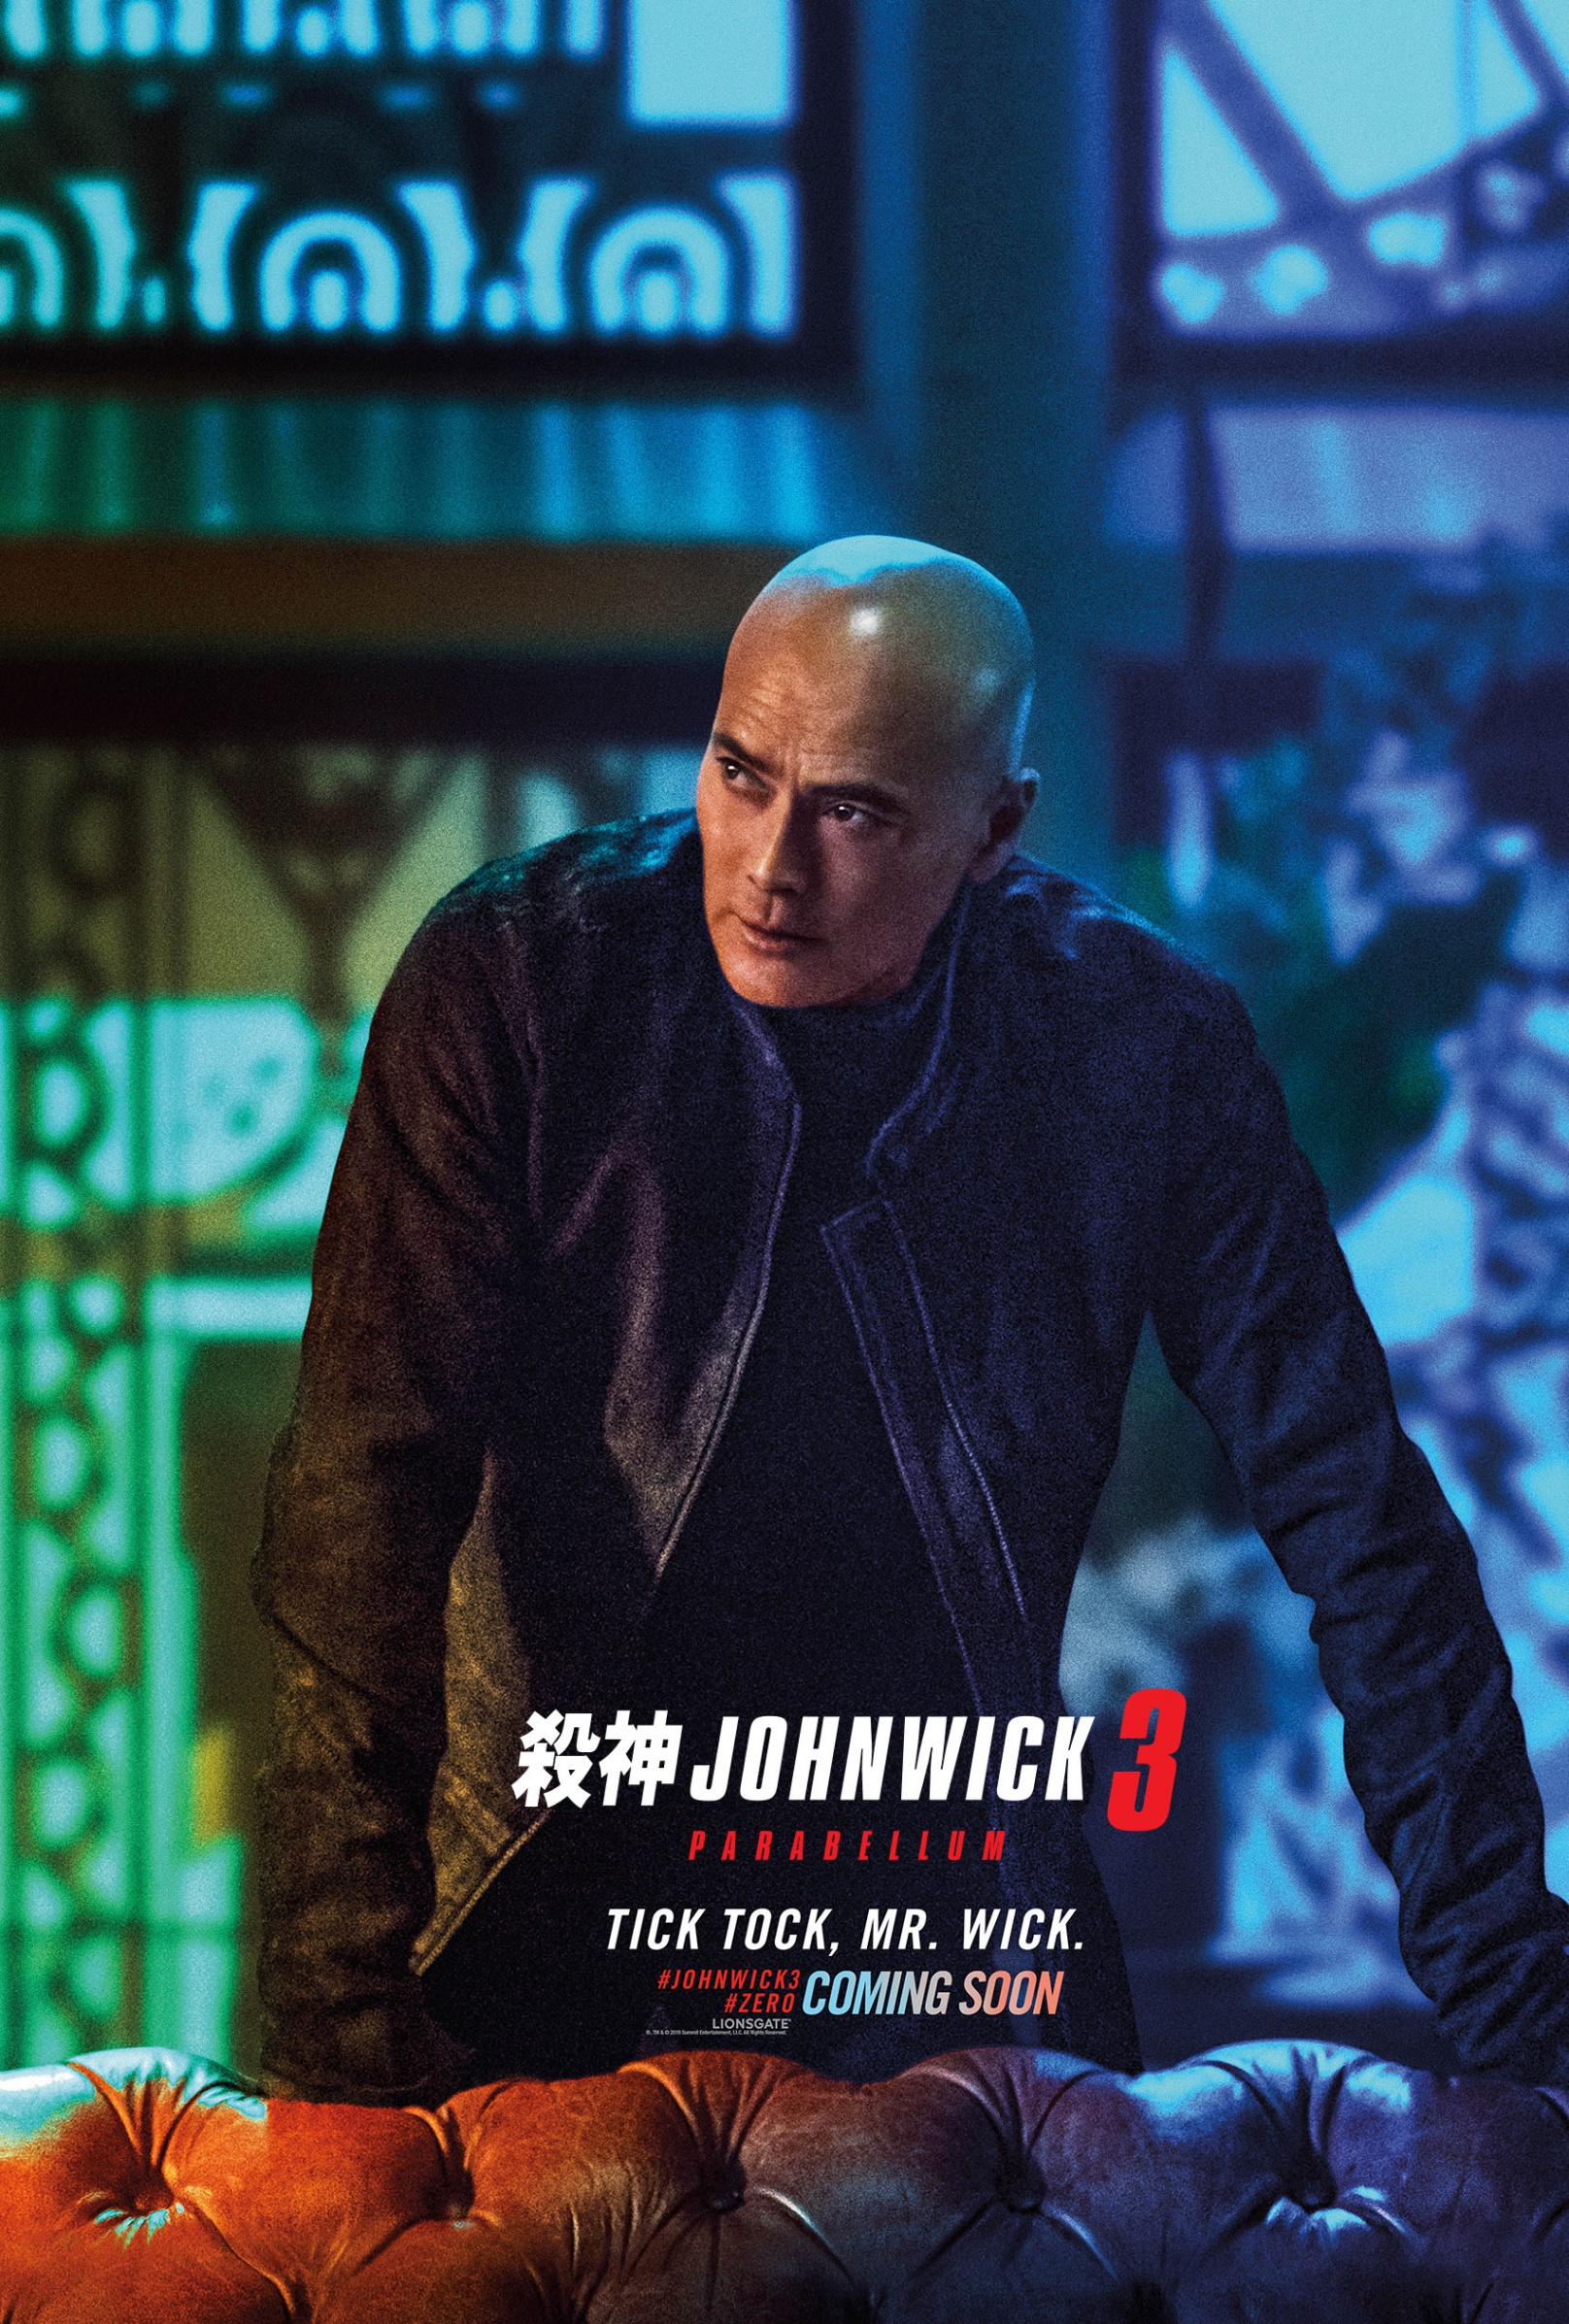 20190322_JohnWick3Parabellum_Poster10.jpg